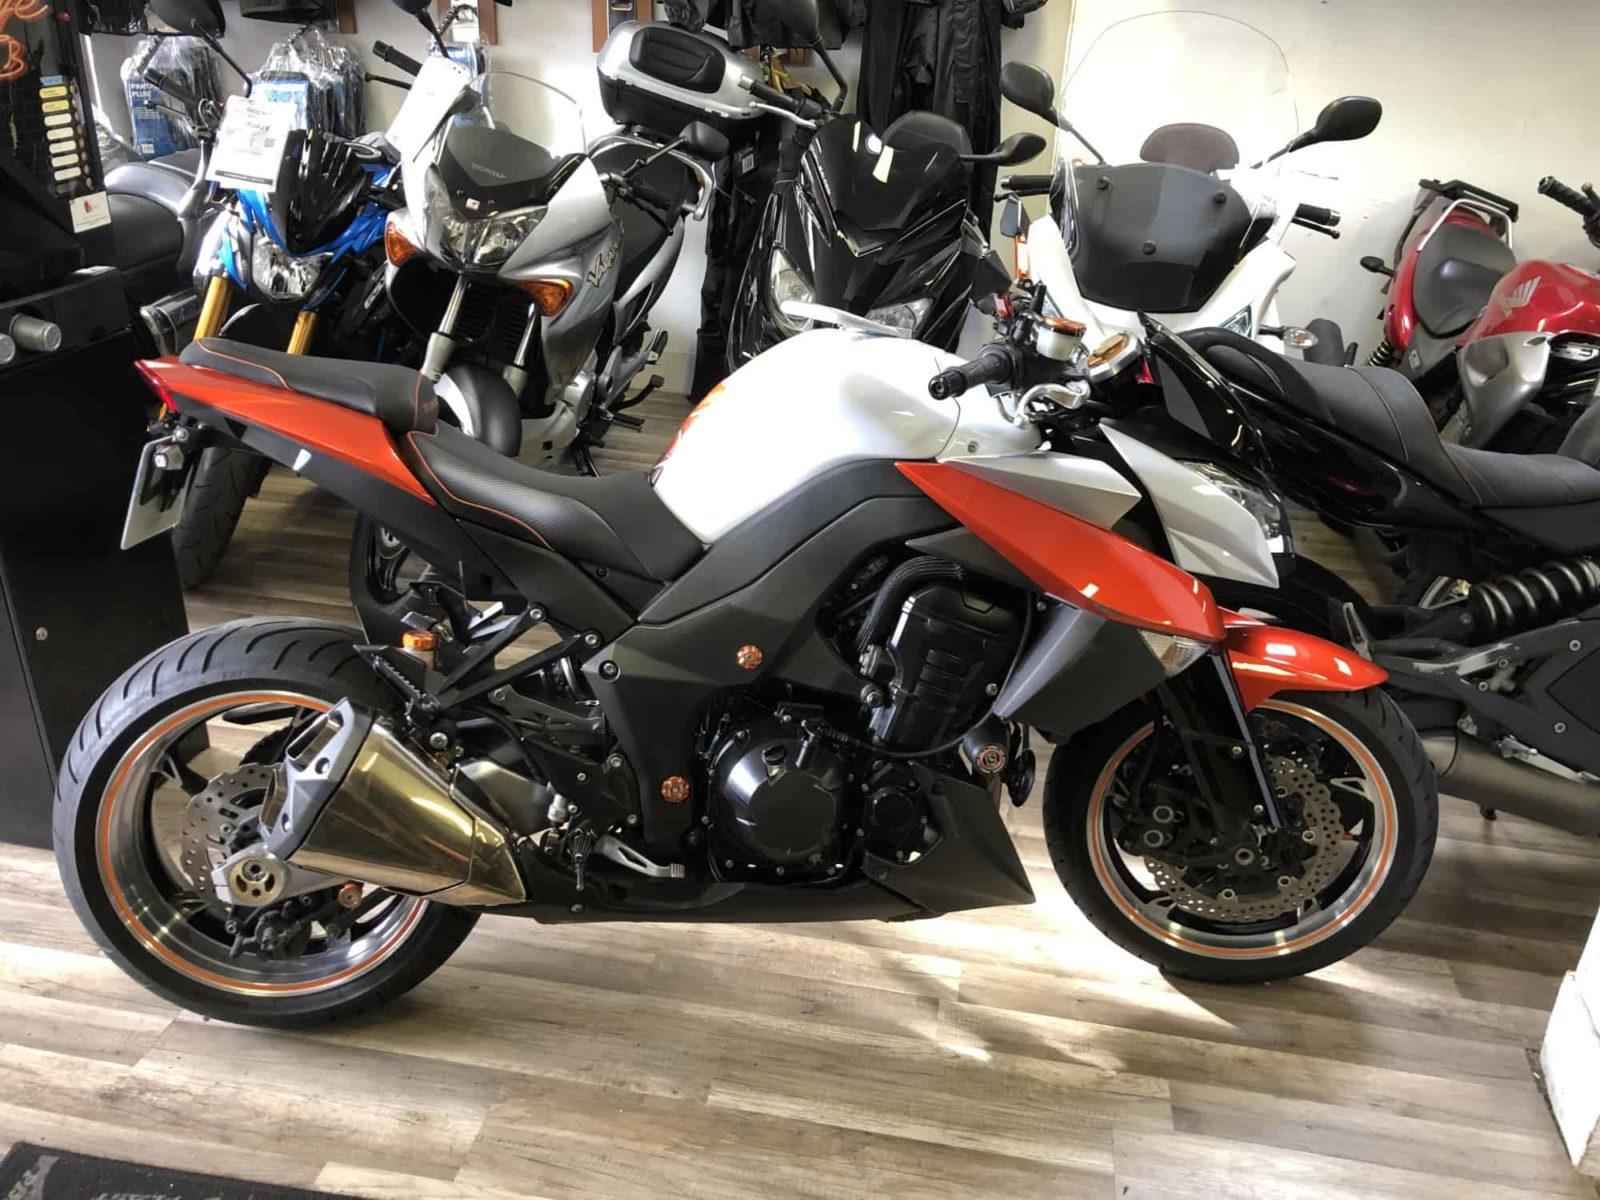 Vendu ! Kawasaki Z1000 – 5800€